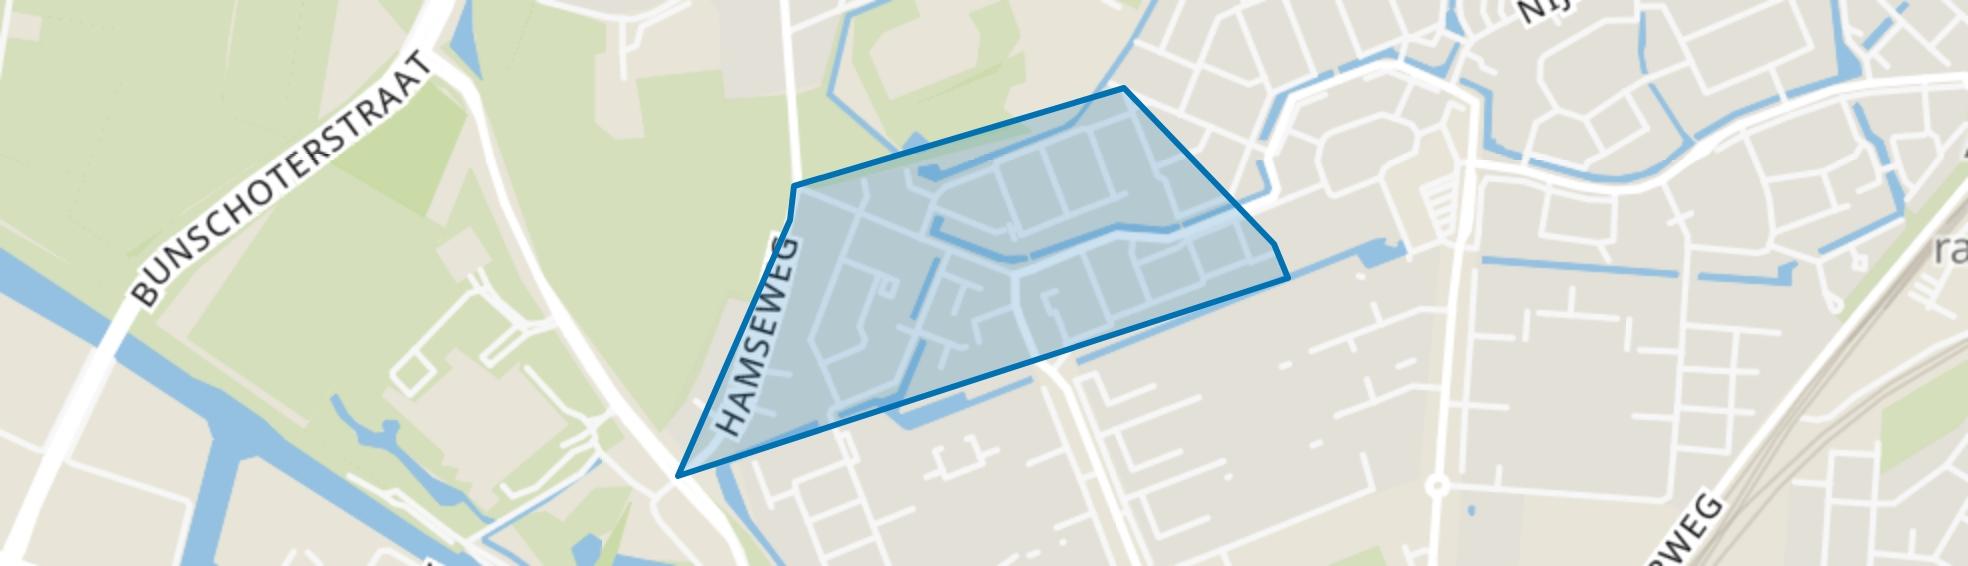 Elly Takmastraat, Amersfoort map